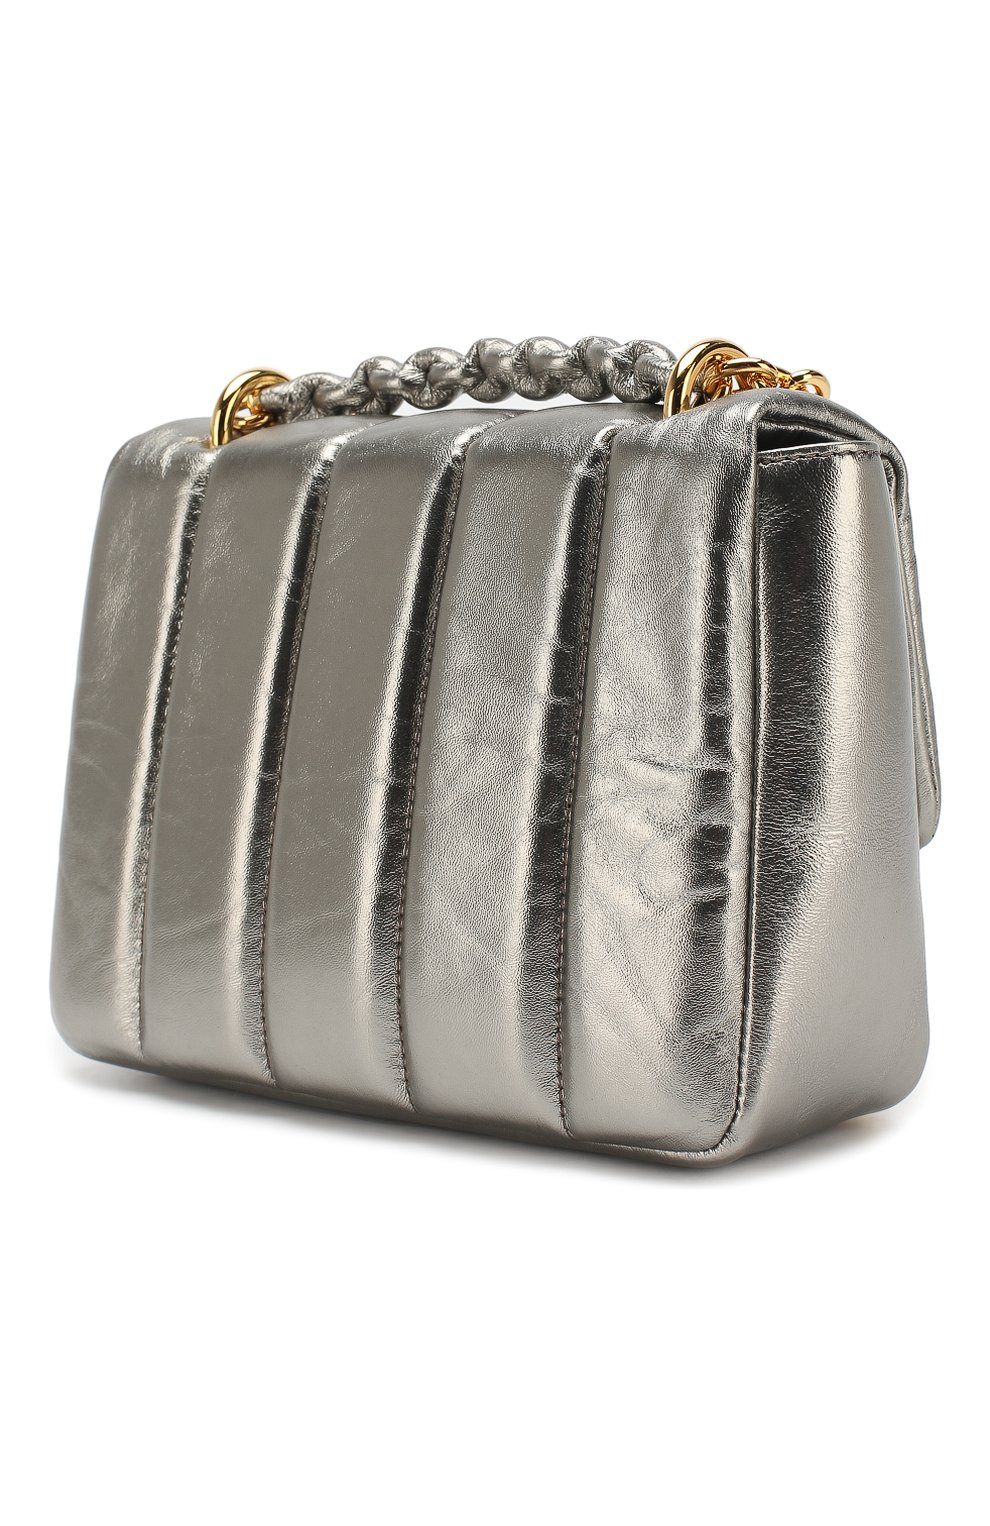 Сумка Natalia Soft medium Tom Ford серебряная цвета   Фото №3